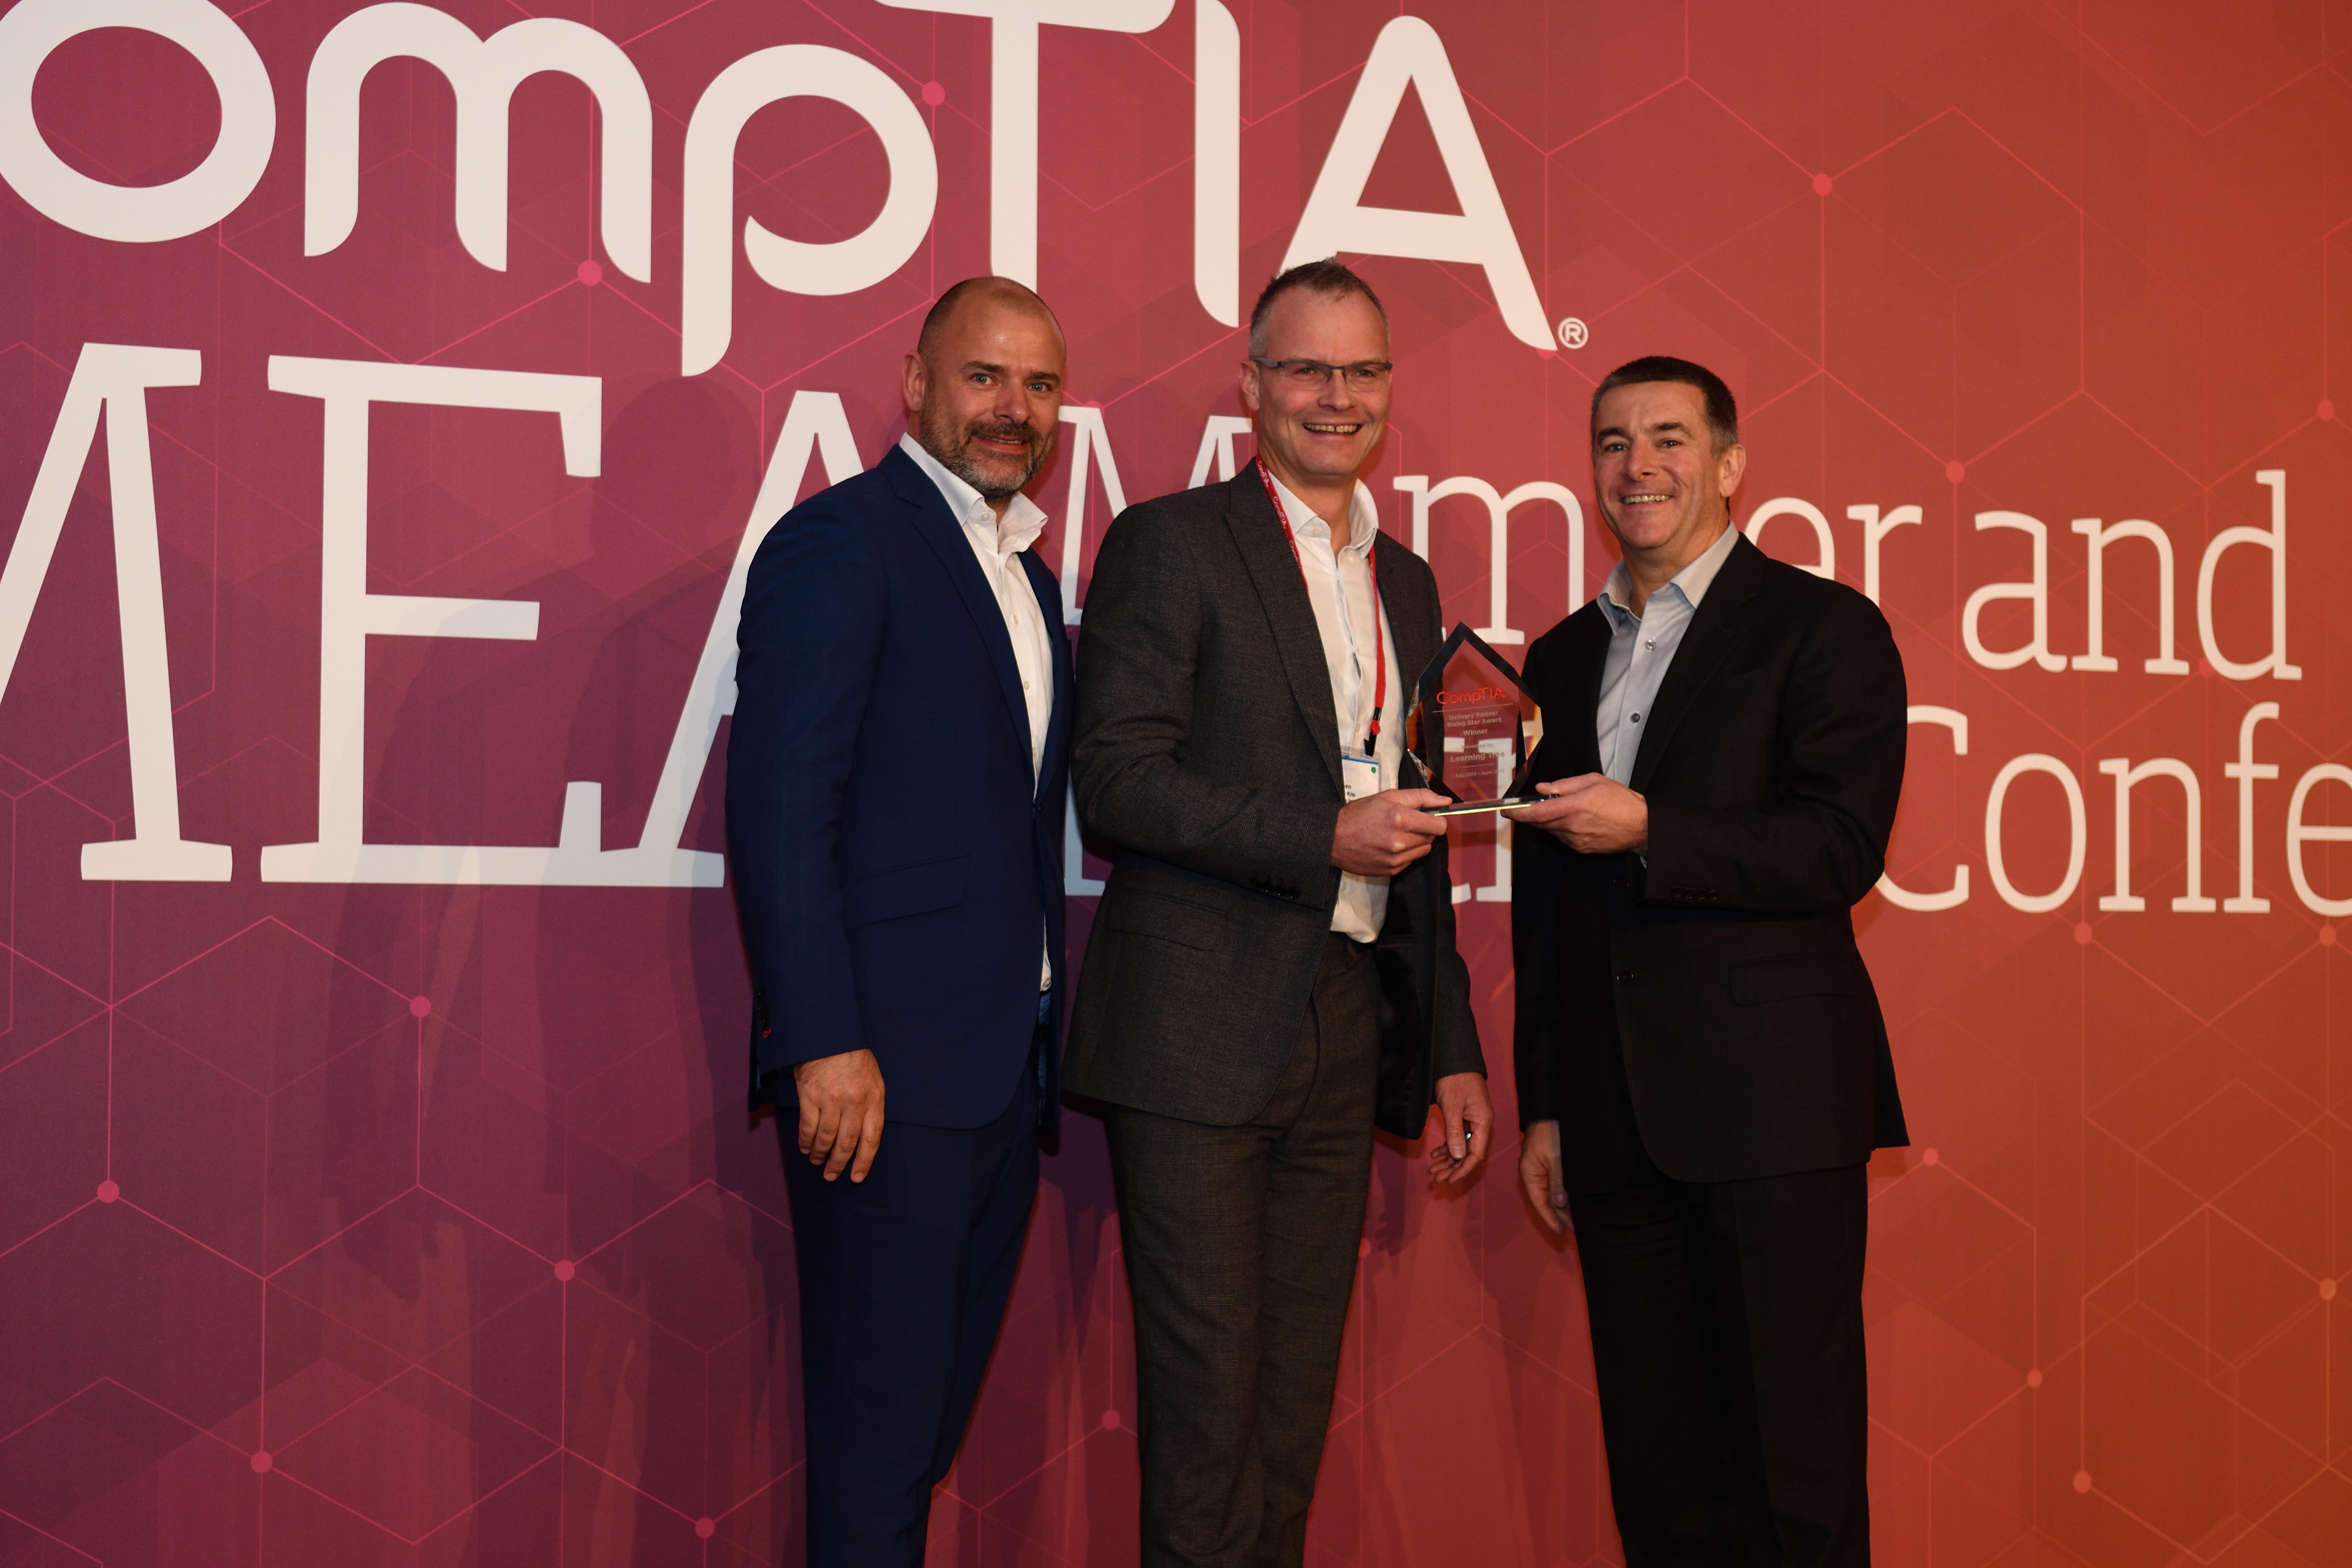 CompTIA EMEA Rising Star Award Ceremony